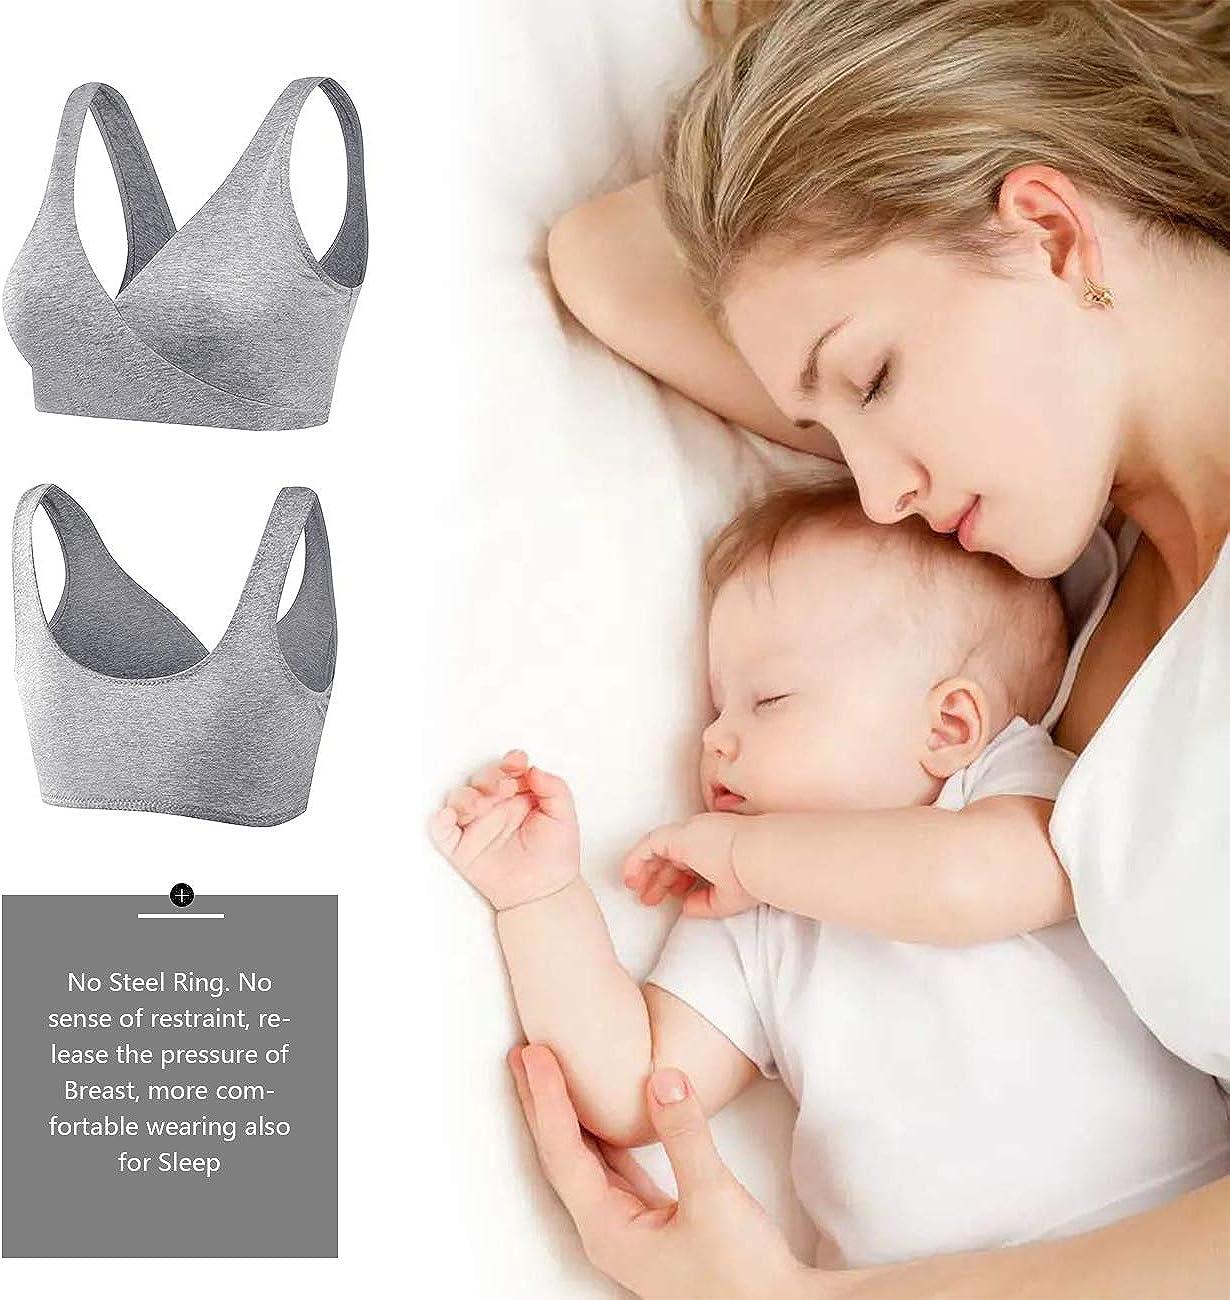 2019 Upgraded Version Sunzel Womens Cotton Spandex Seamless Sleep Bra for Nursing and Maternity XXL, Gray